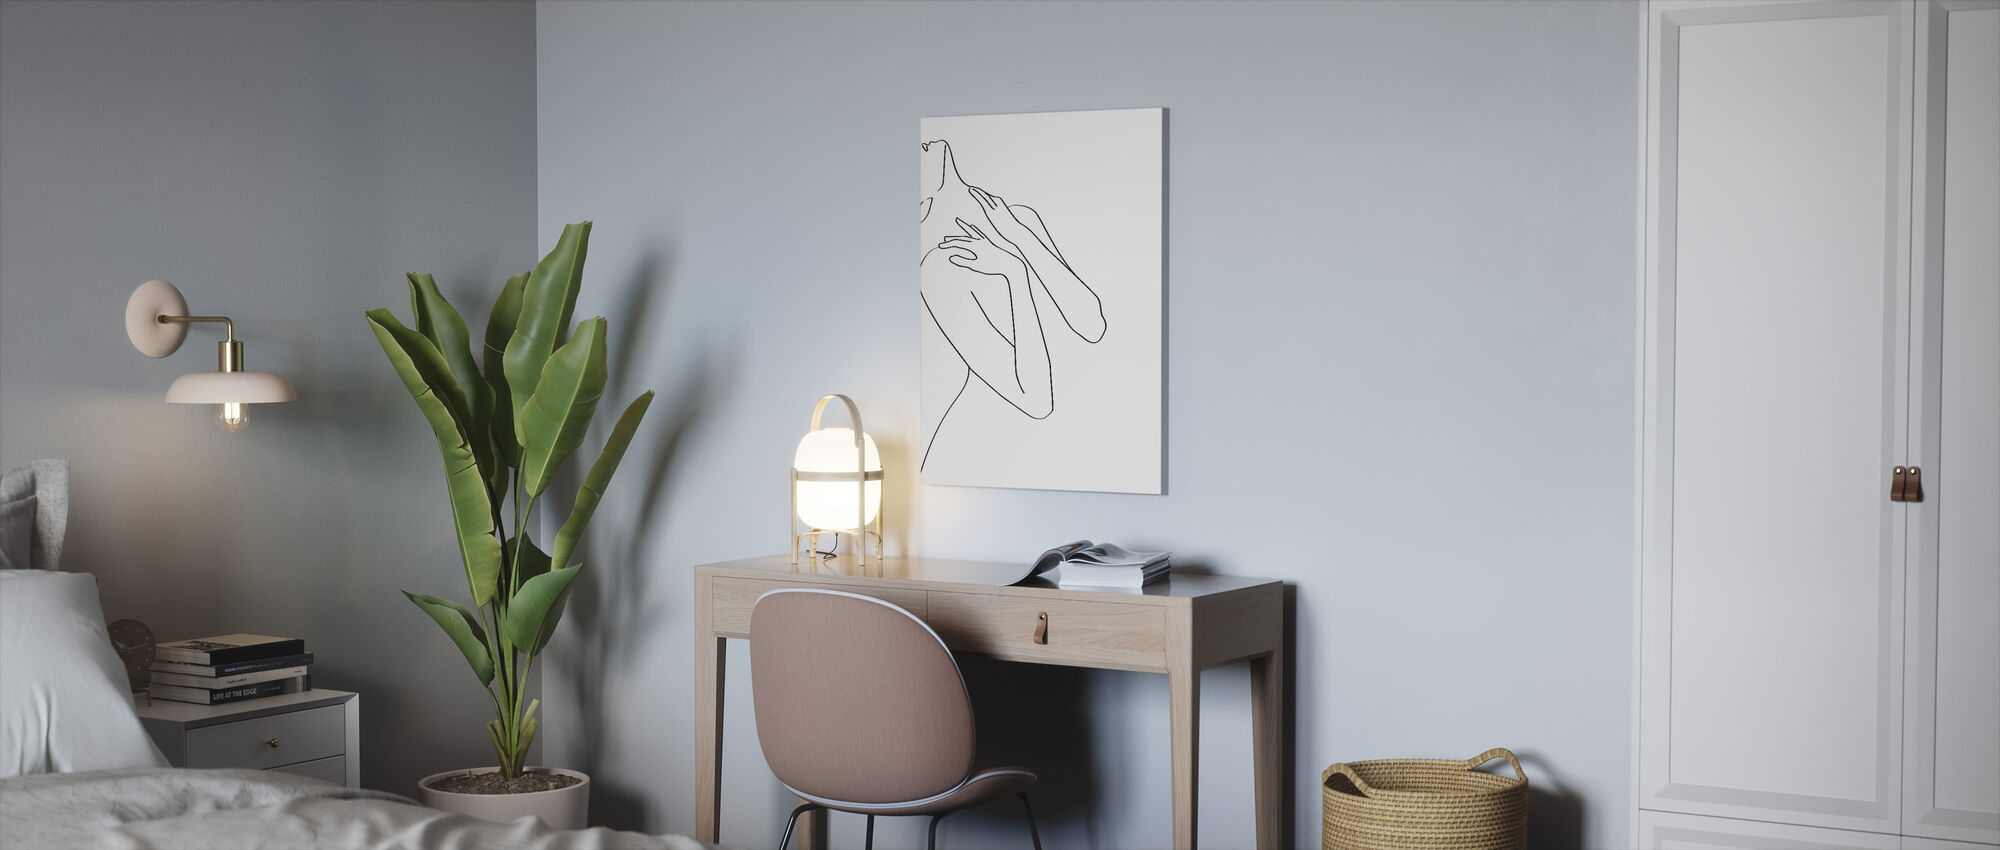 Beauty - Canvas print - Office